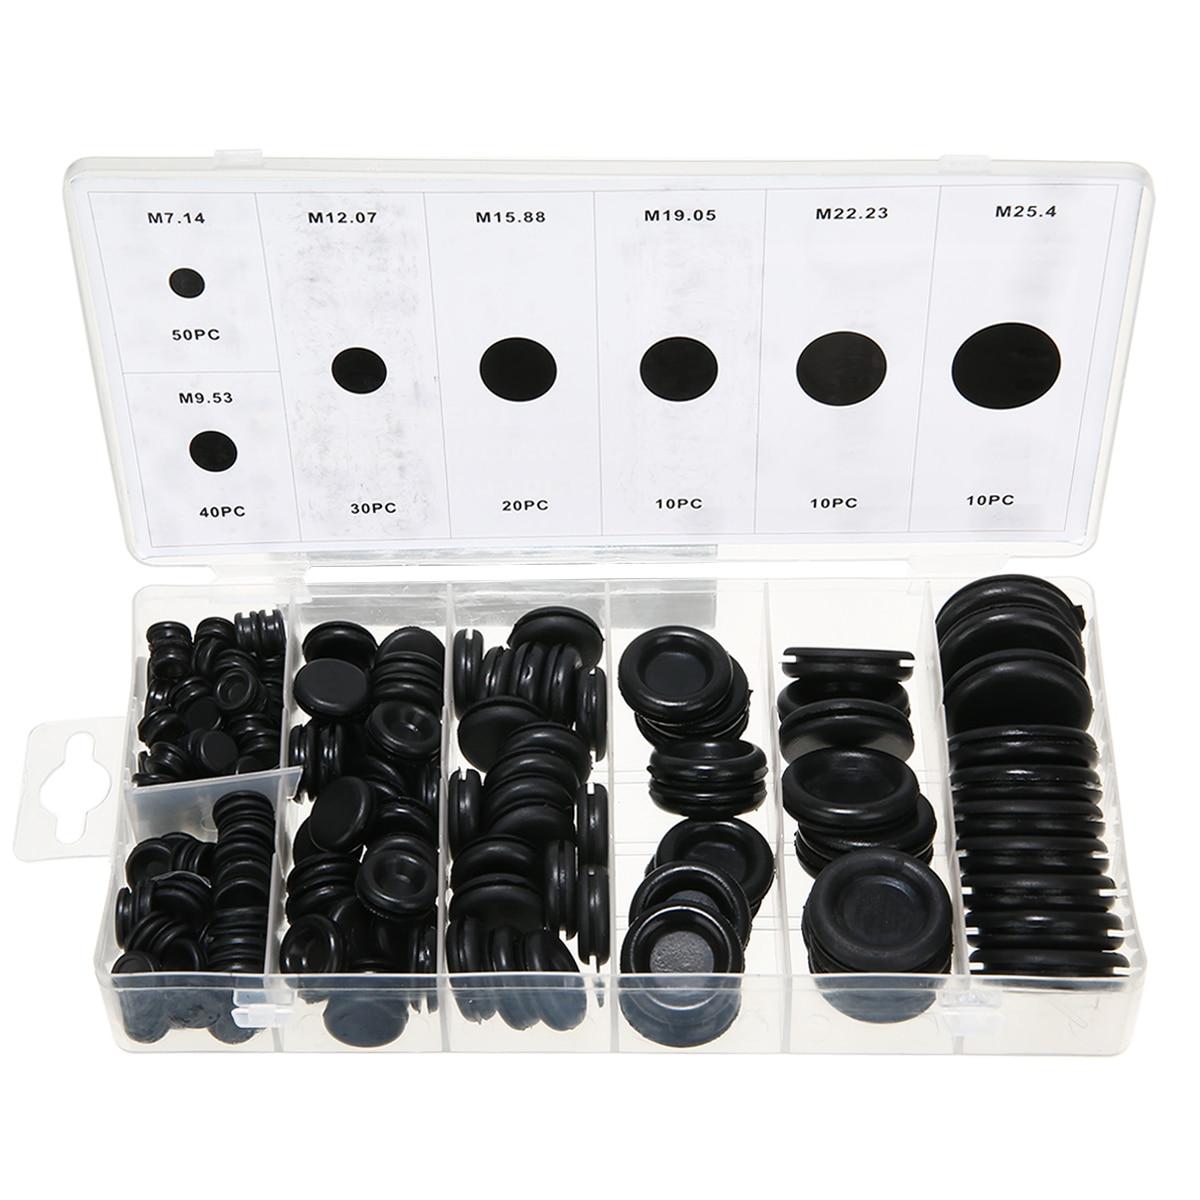 170pcs/box Rubber Grommet Hole Plug Set Car Electrical Wire Cable Gasket Kit Black Round Fastener Grommets Decoration